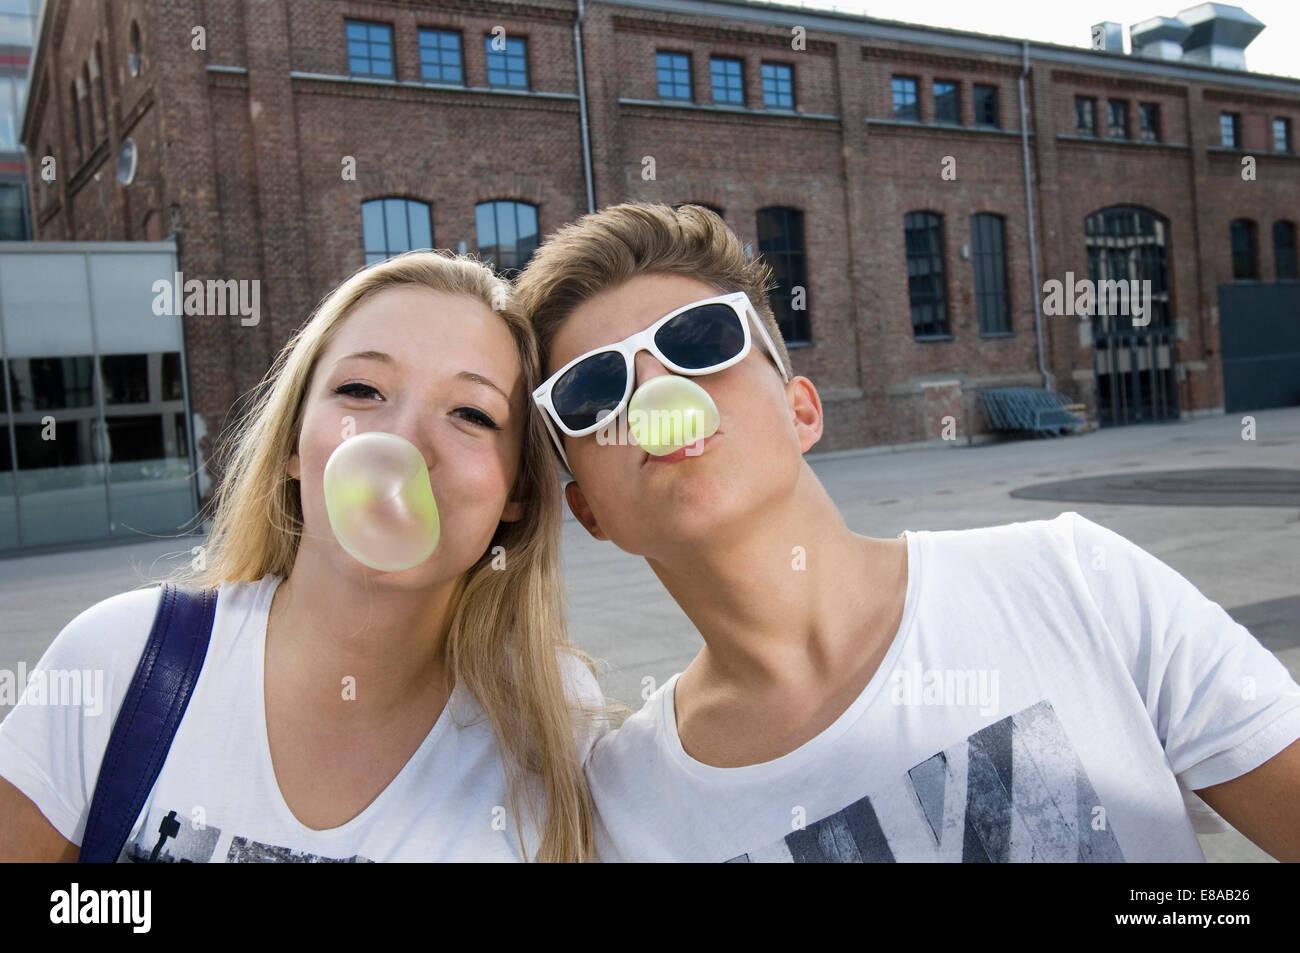 Teenage couple blowing bubble gum - Stock Image